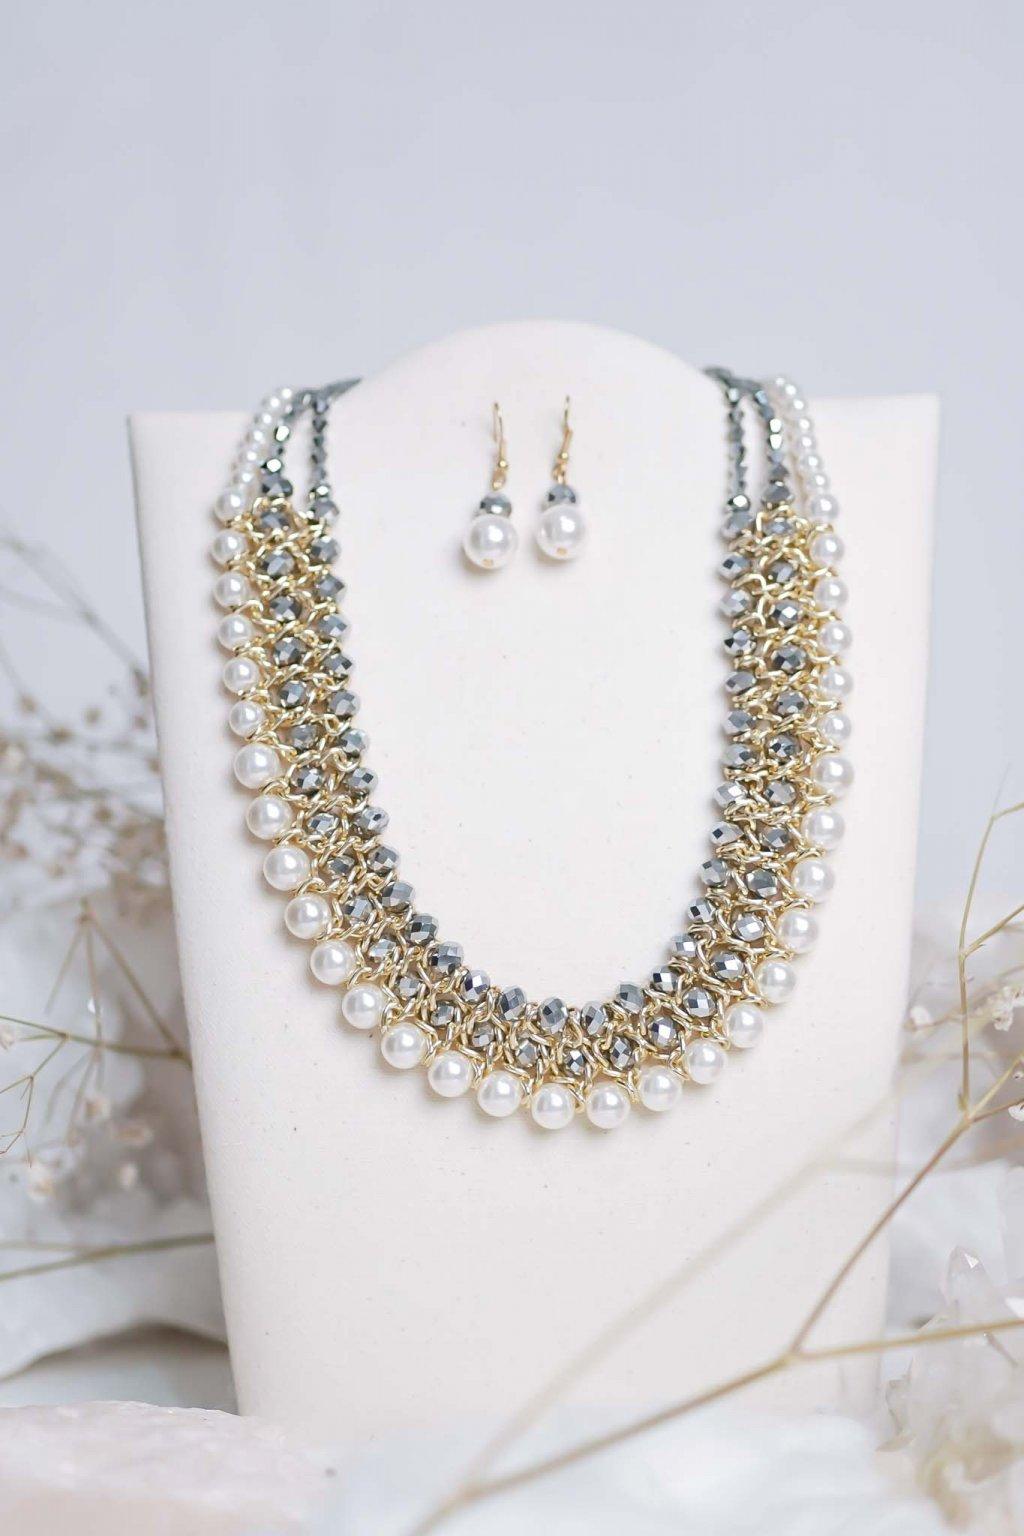 náhrdelník, šperk, spoločenská náhrdelník, náhrdelník na bežný deň, výrazný náhrdelník, jemný náhrdelník, šperky, náhrdelník na ples, svadbu, stužkovú 42